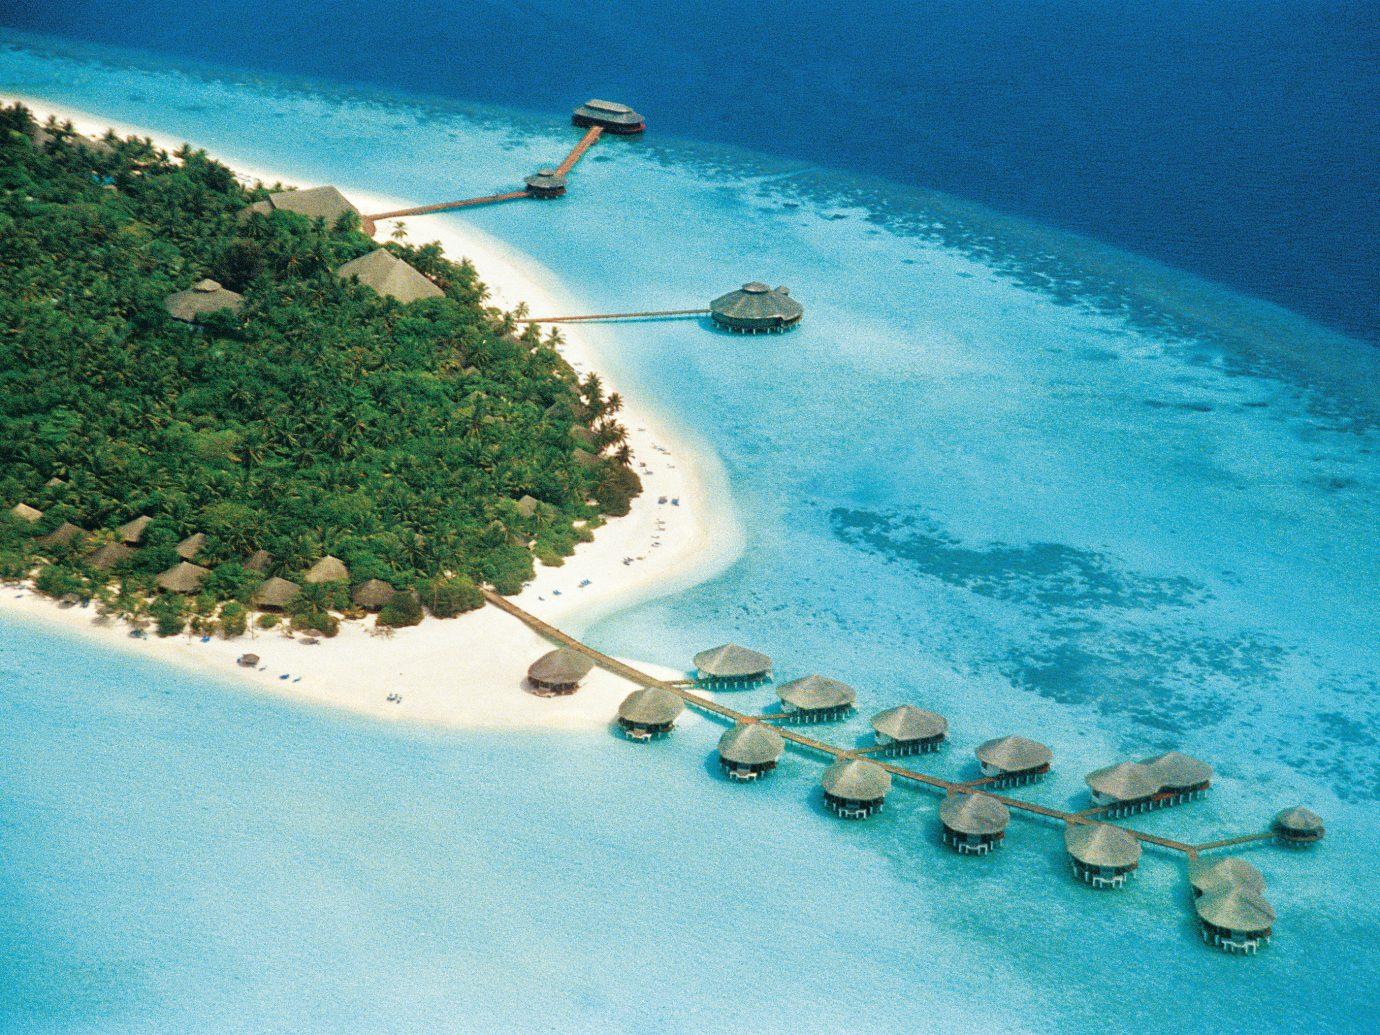 Budget News Trip Ideas water reef Nature landform geographical feature Sea Beach Ocean caribbean Coast vacation Island cape atoll islet Lagoon bay archipelago vehicle shore swimming